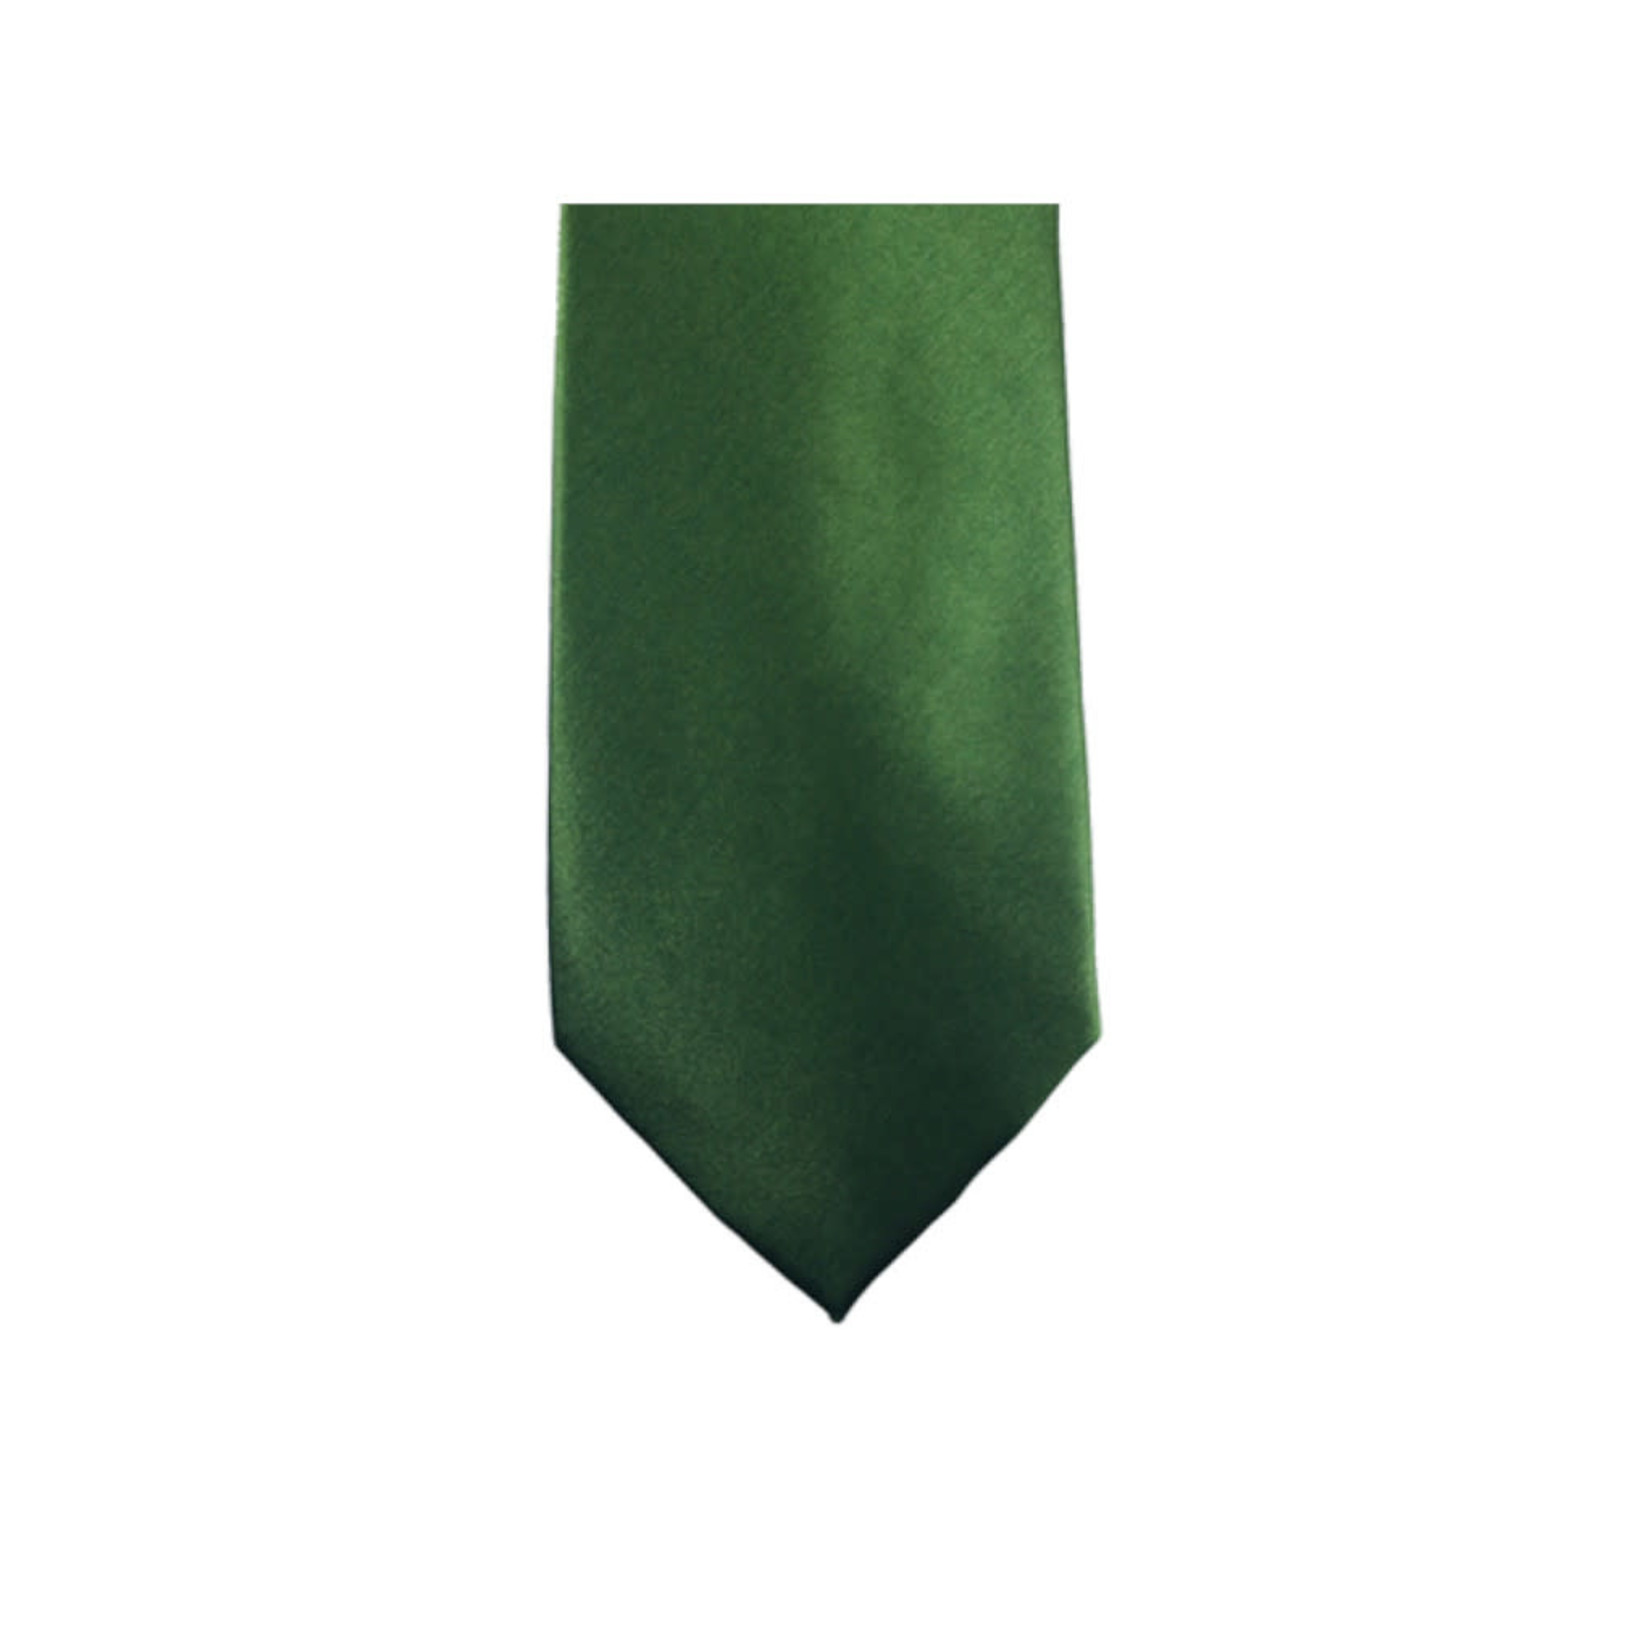 Knotz M100-25 Solid Green Tie